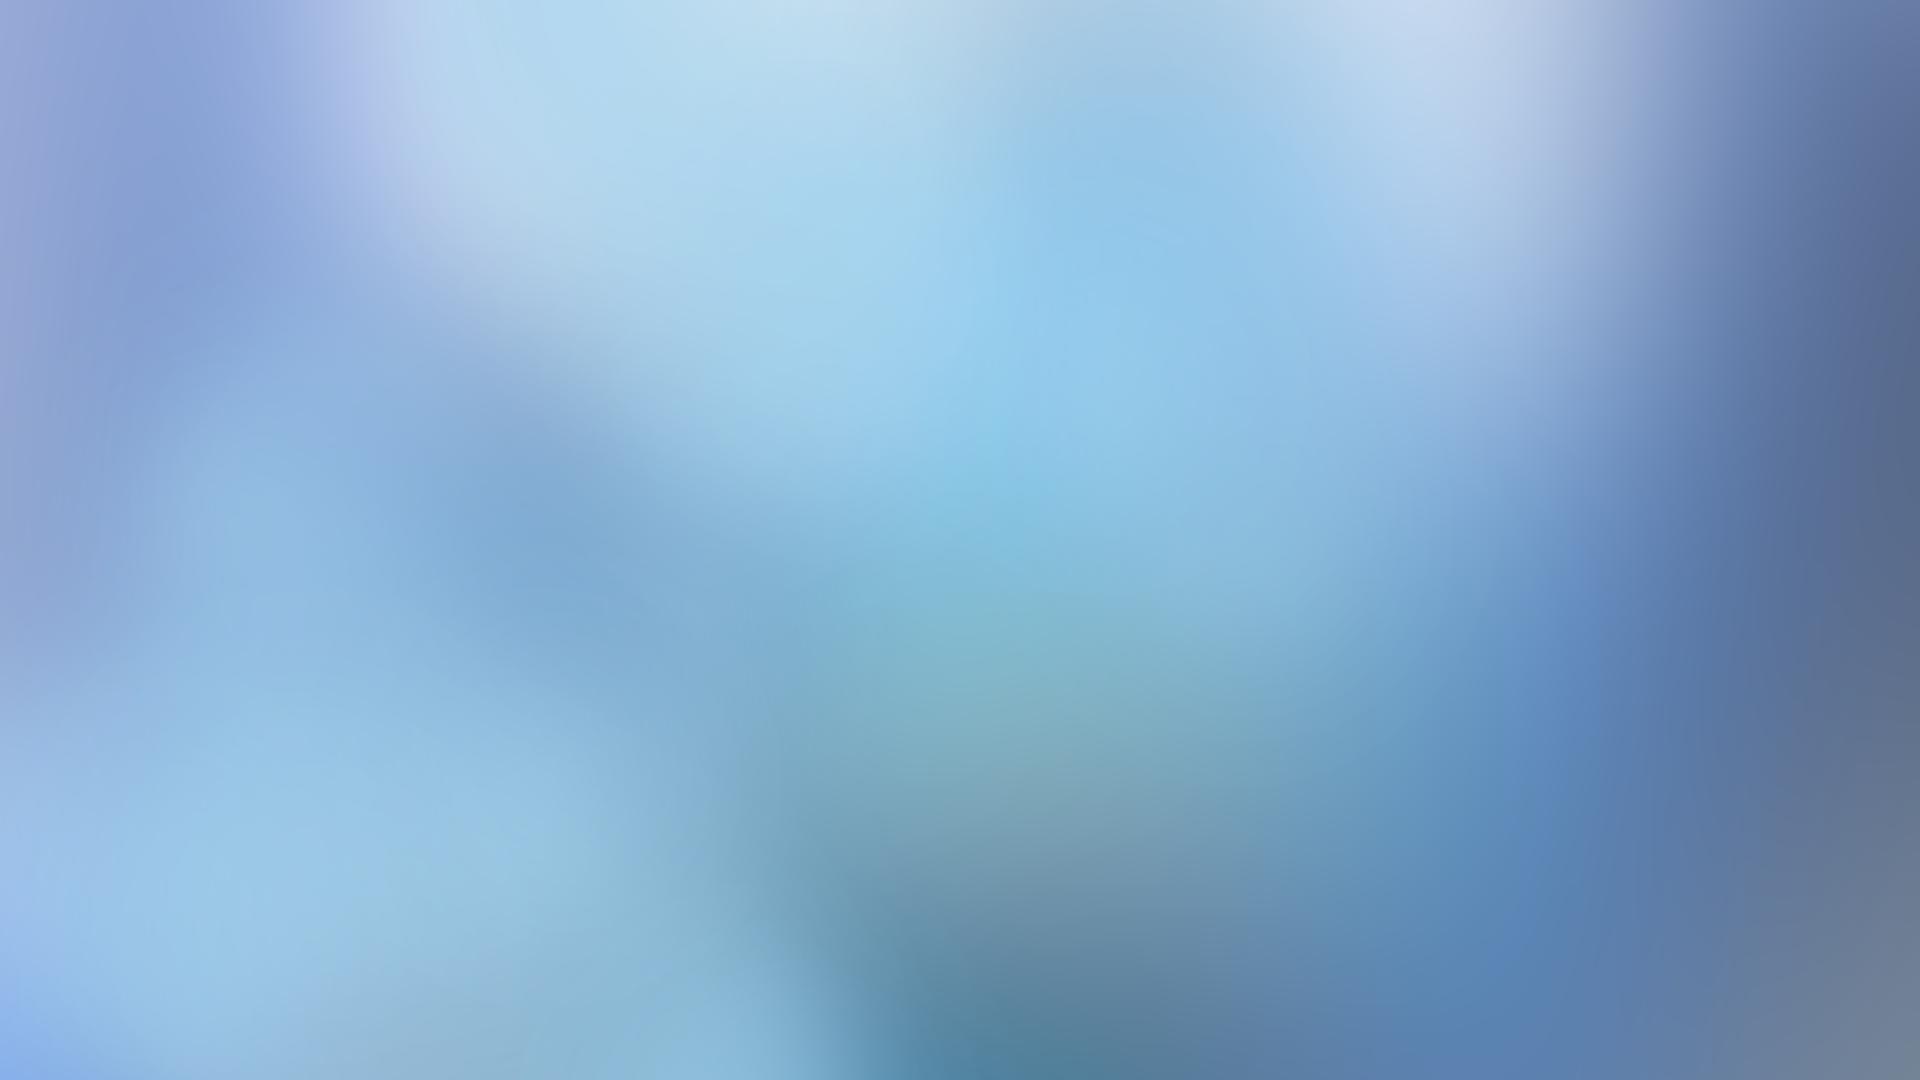 blue blur 2 wallpaper - photo #43